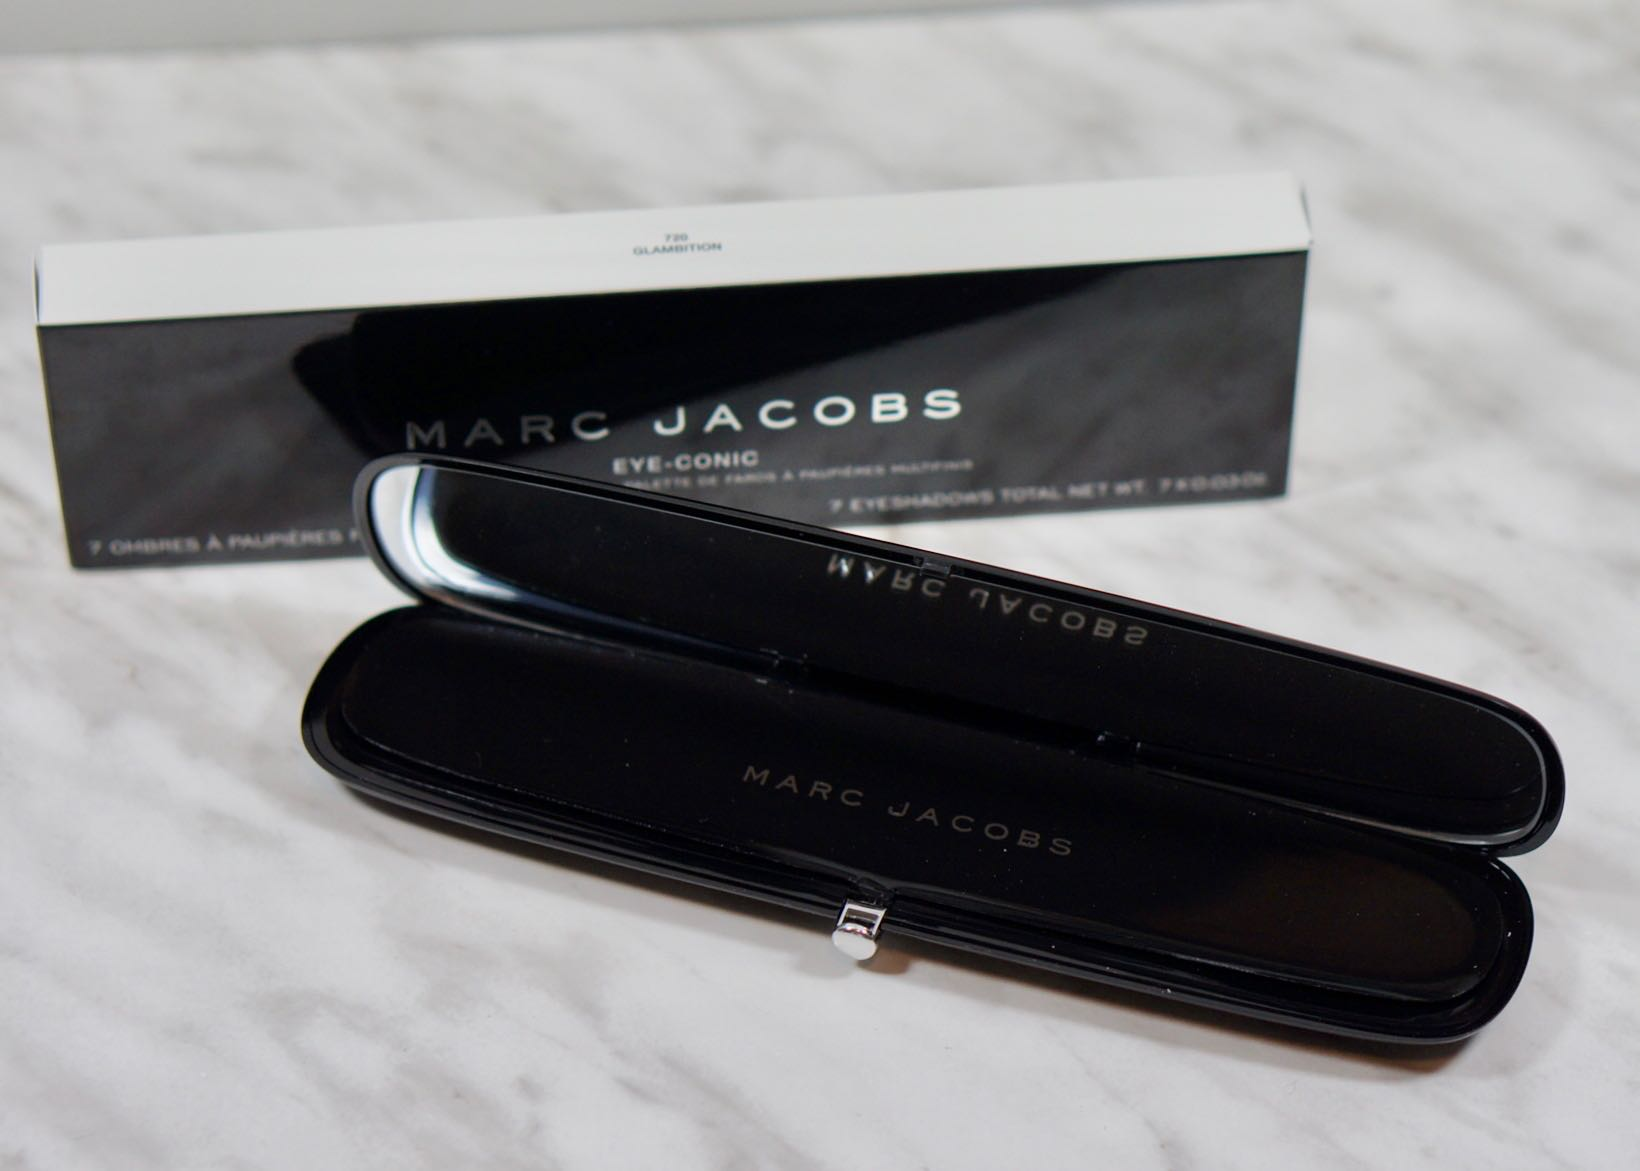 Marc Jacobs Eye-Conic Palette-720 GlambitionDSC04974.jpg